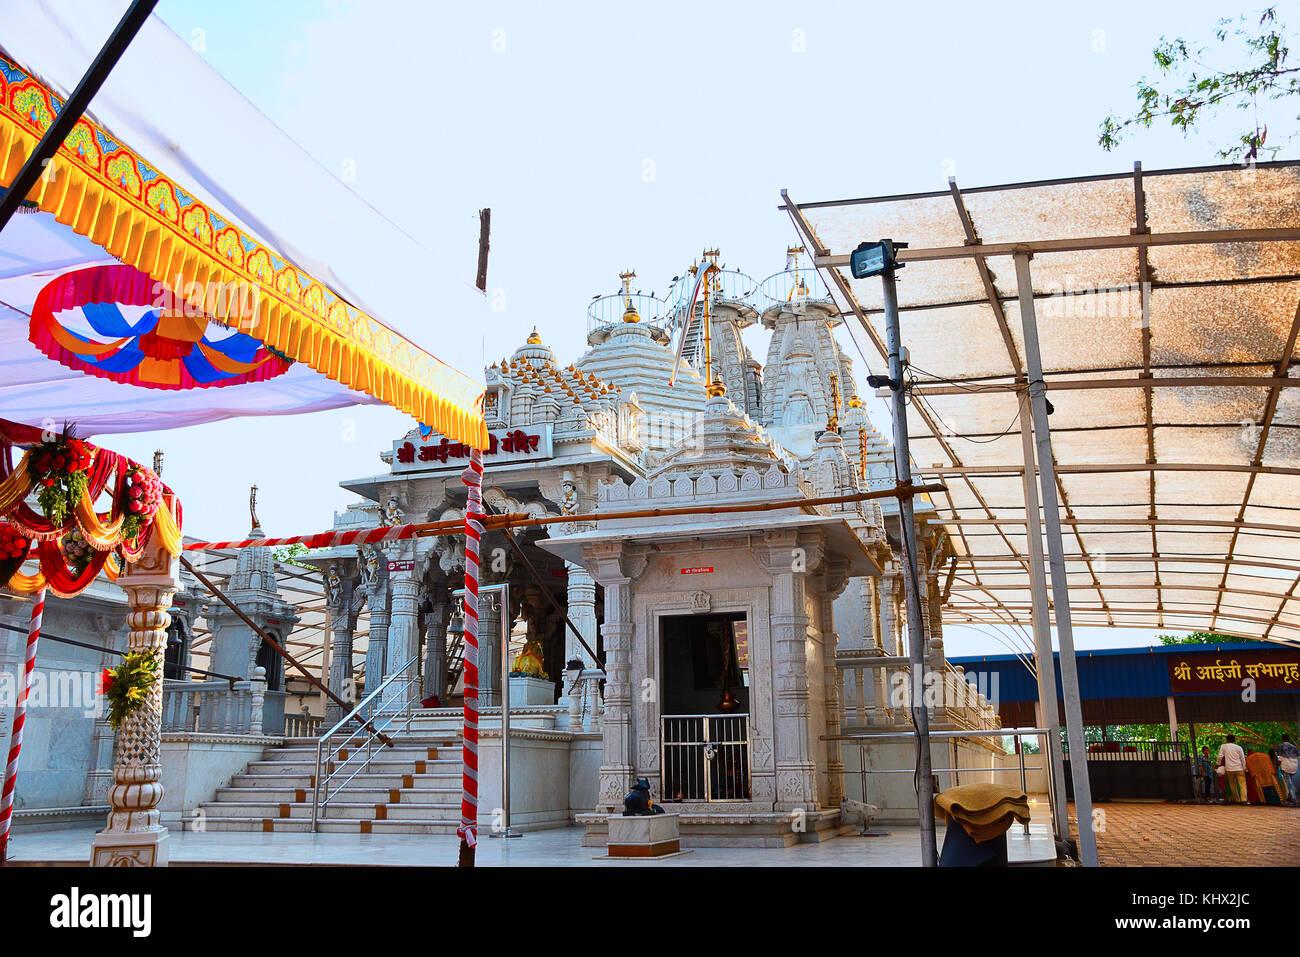 Temple facade, Shree Aai Mathaji Devi, Katraj road, Pune. Maharashtra, India - Stock Image